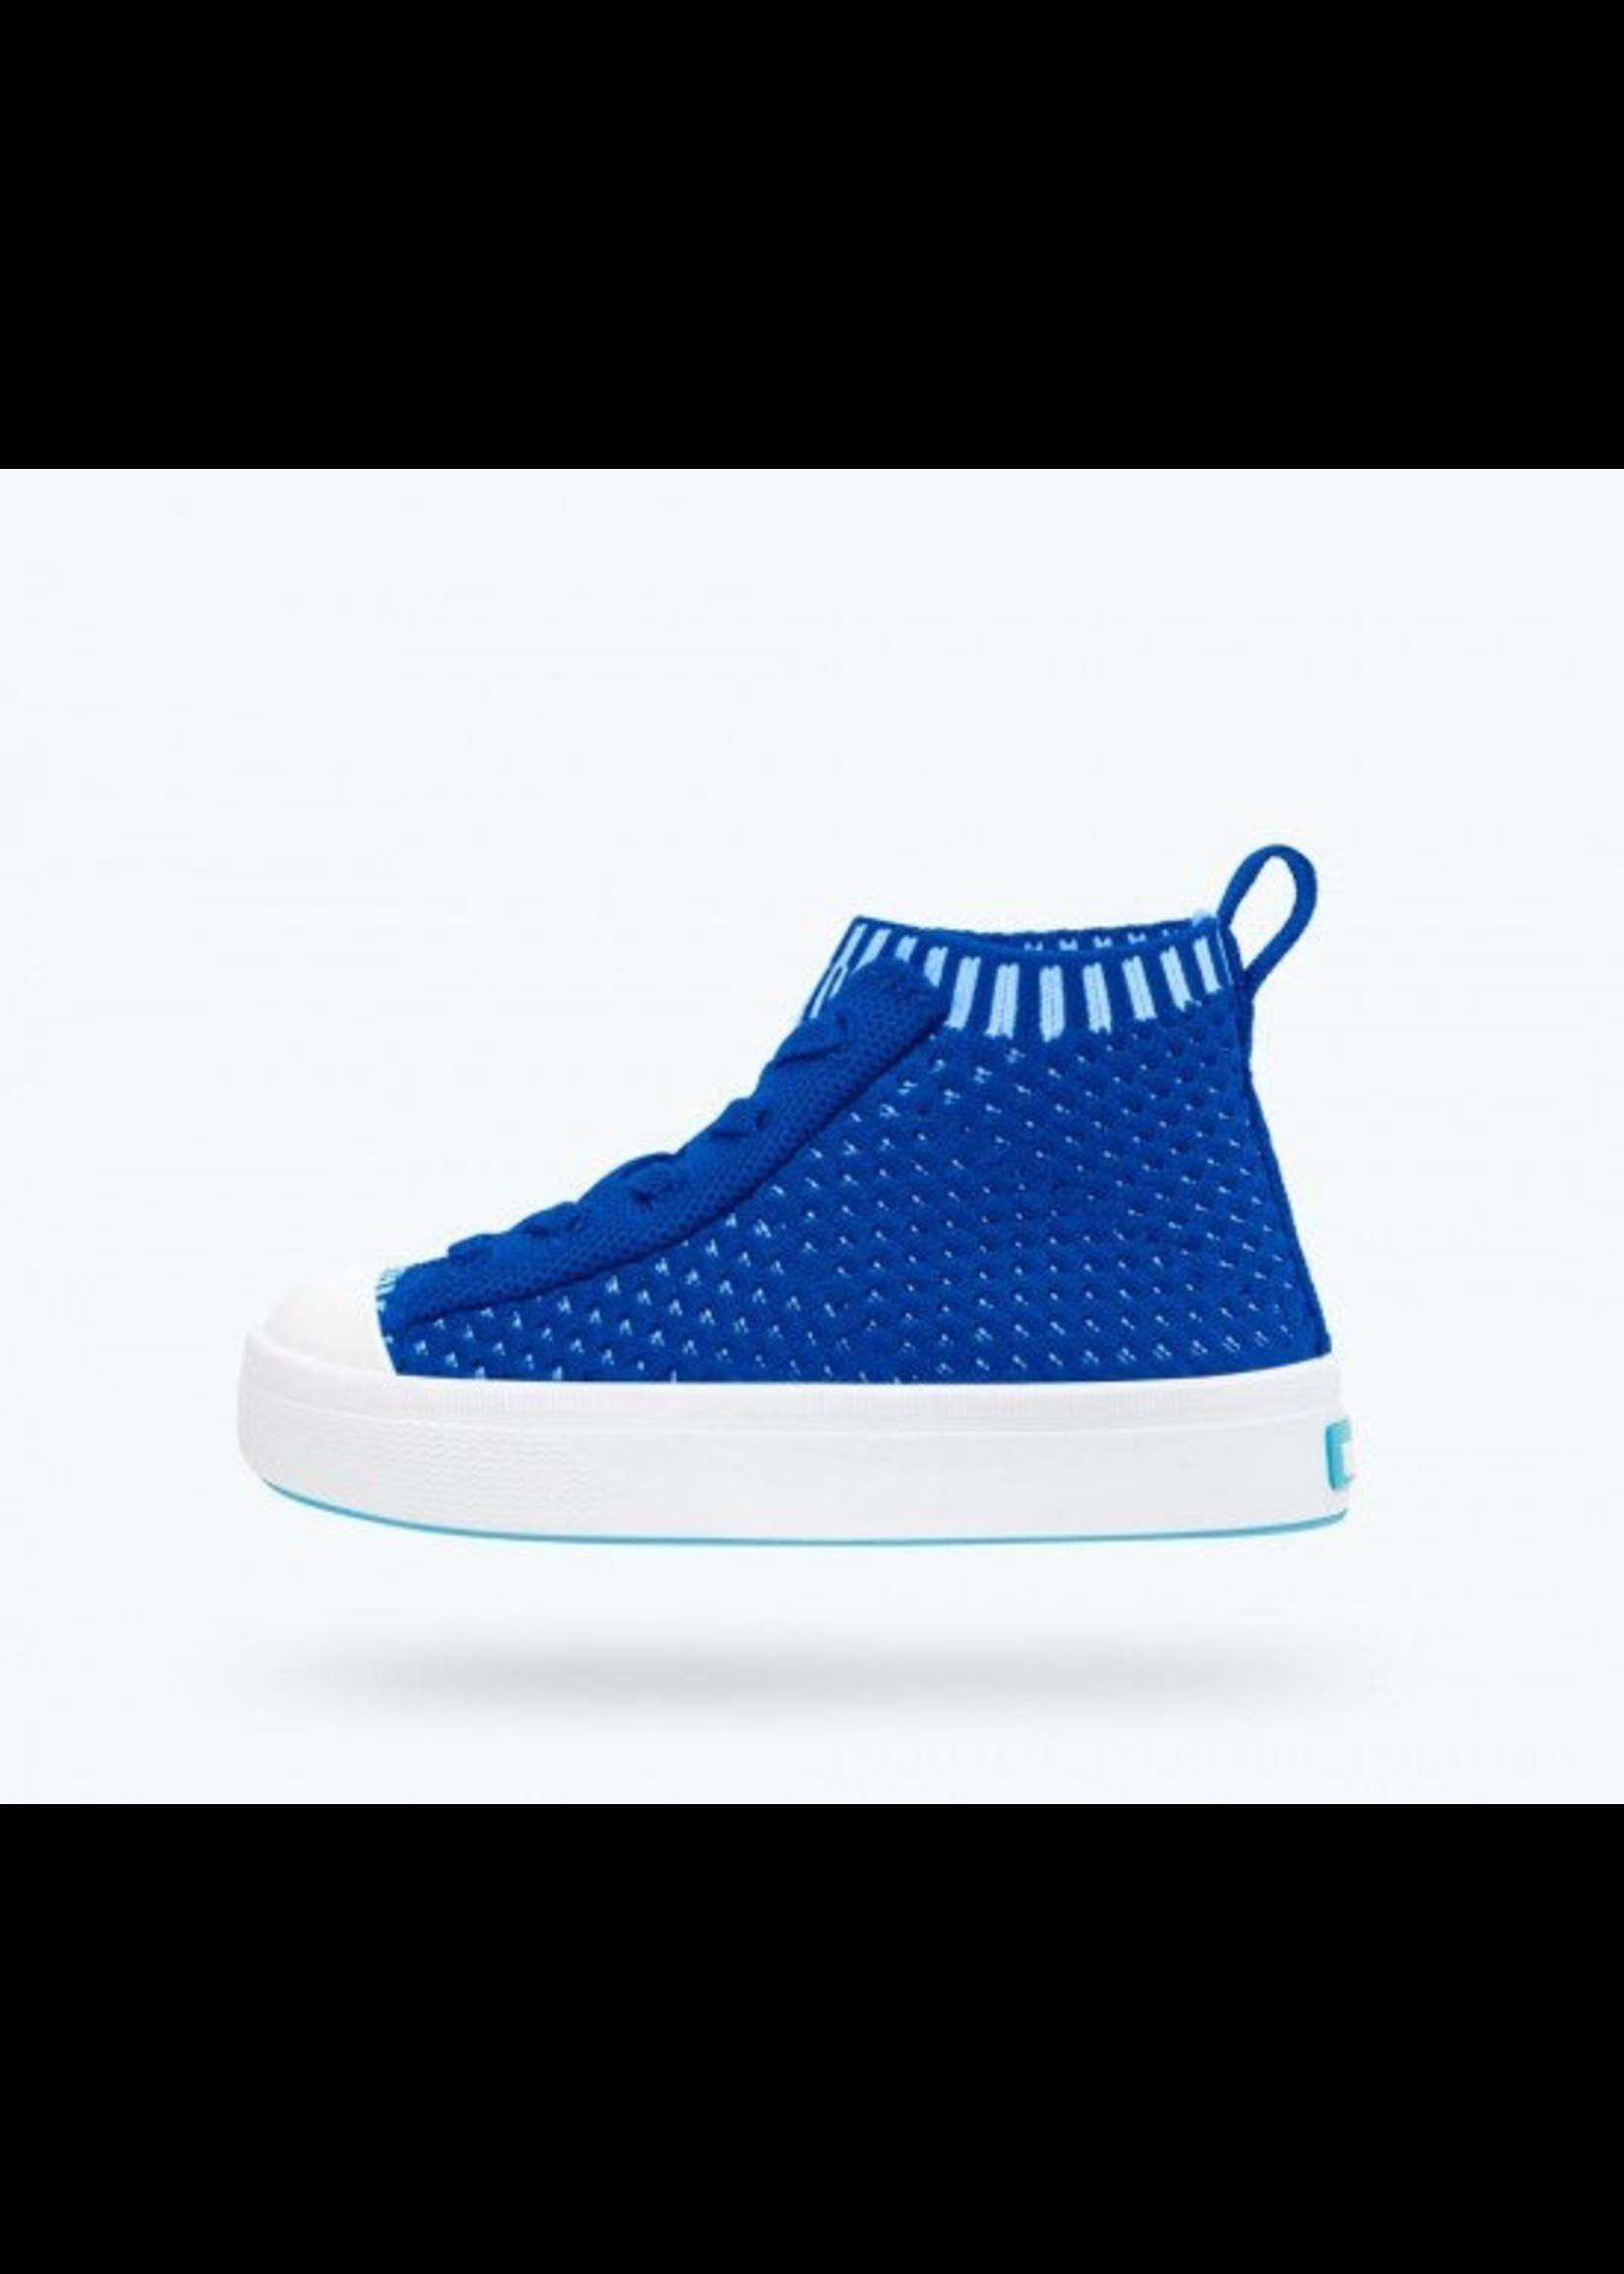 Native Shoes Native, Jefferson 2.0 Hightop Liteknit Child